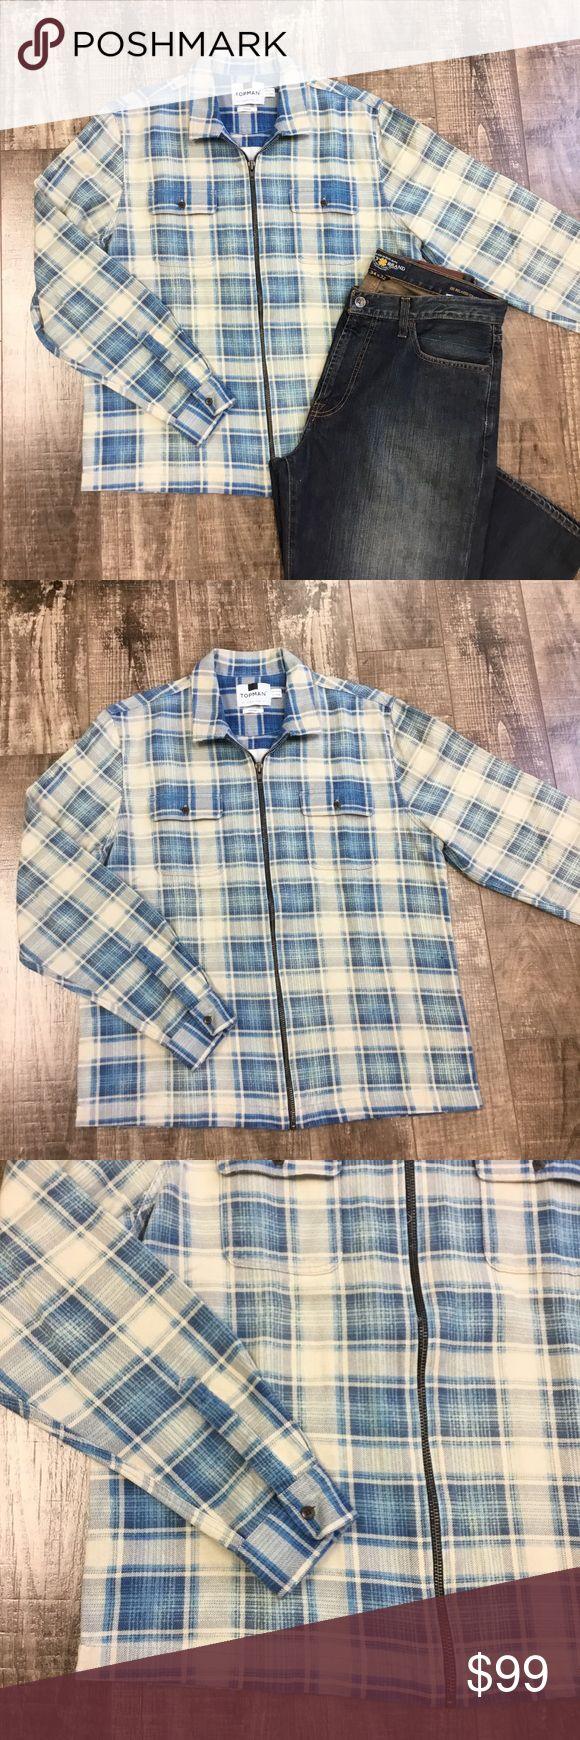 Men's Zip-Up Overshirt 100% cotton. Warm. Distressed look. Topman Jackets & Coats Lightweight & Shirt Jackets